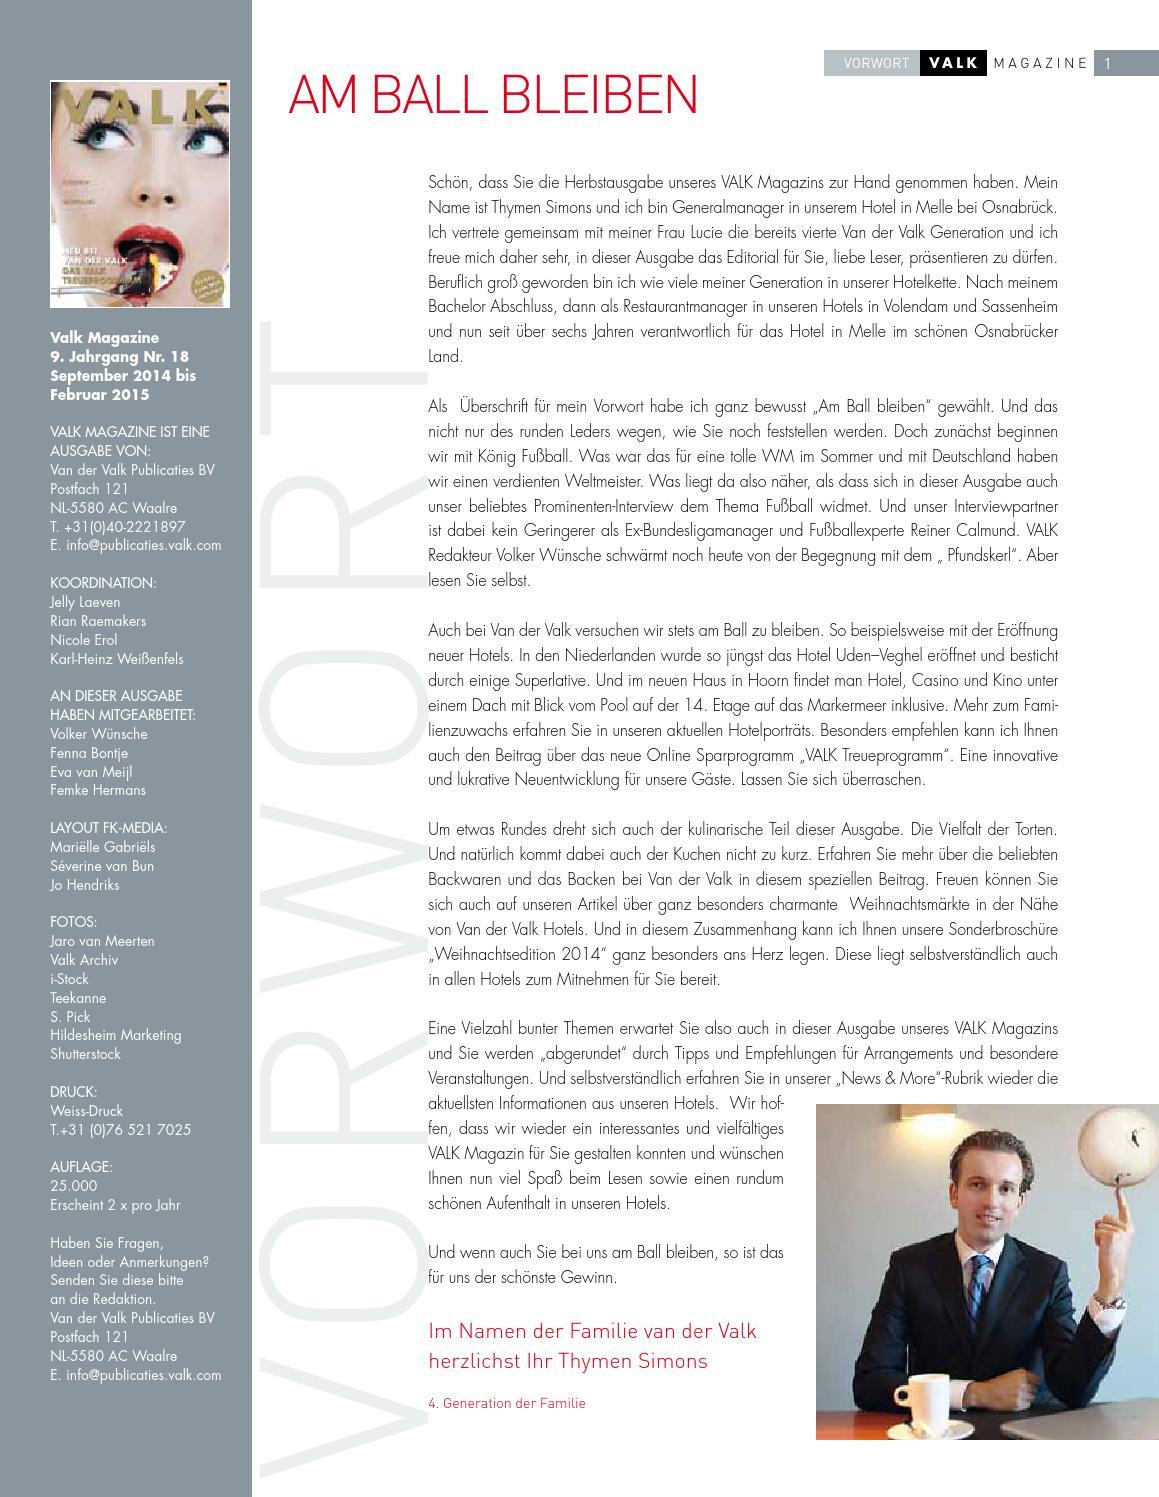 2014 09 Vdv Magazin Web By Van Der Valk Hotel Restaurants